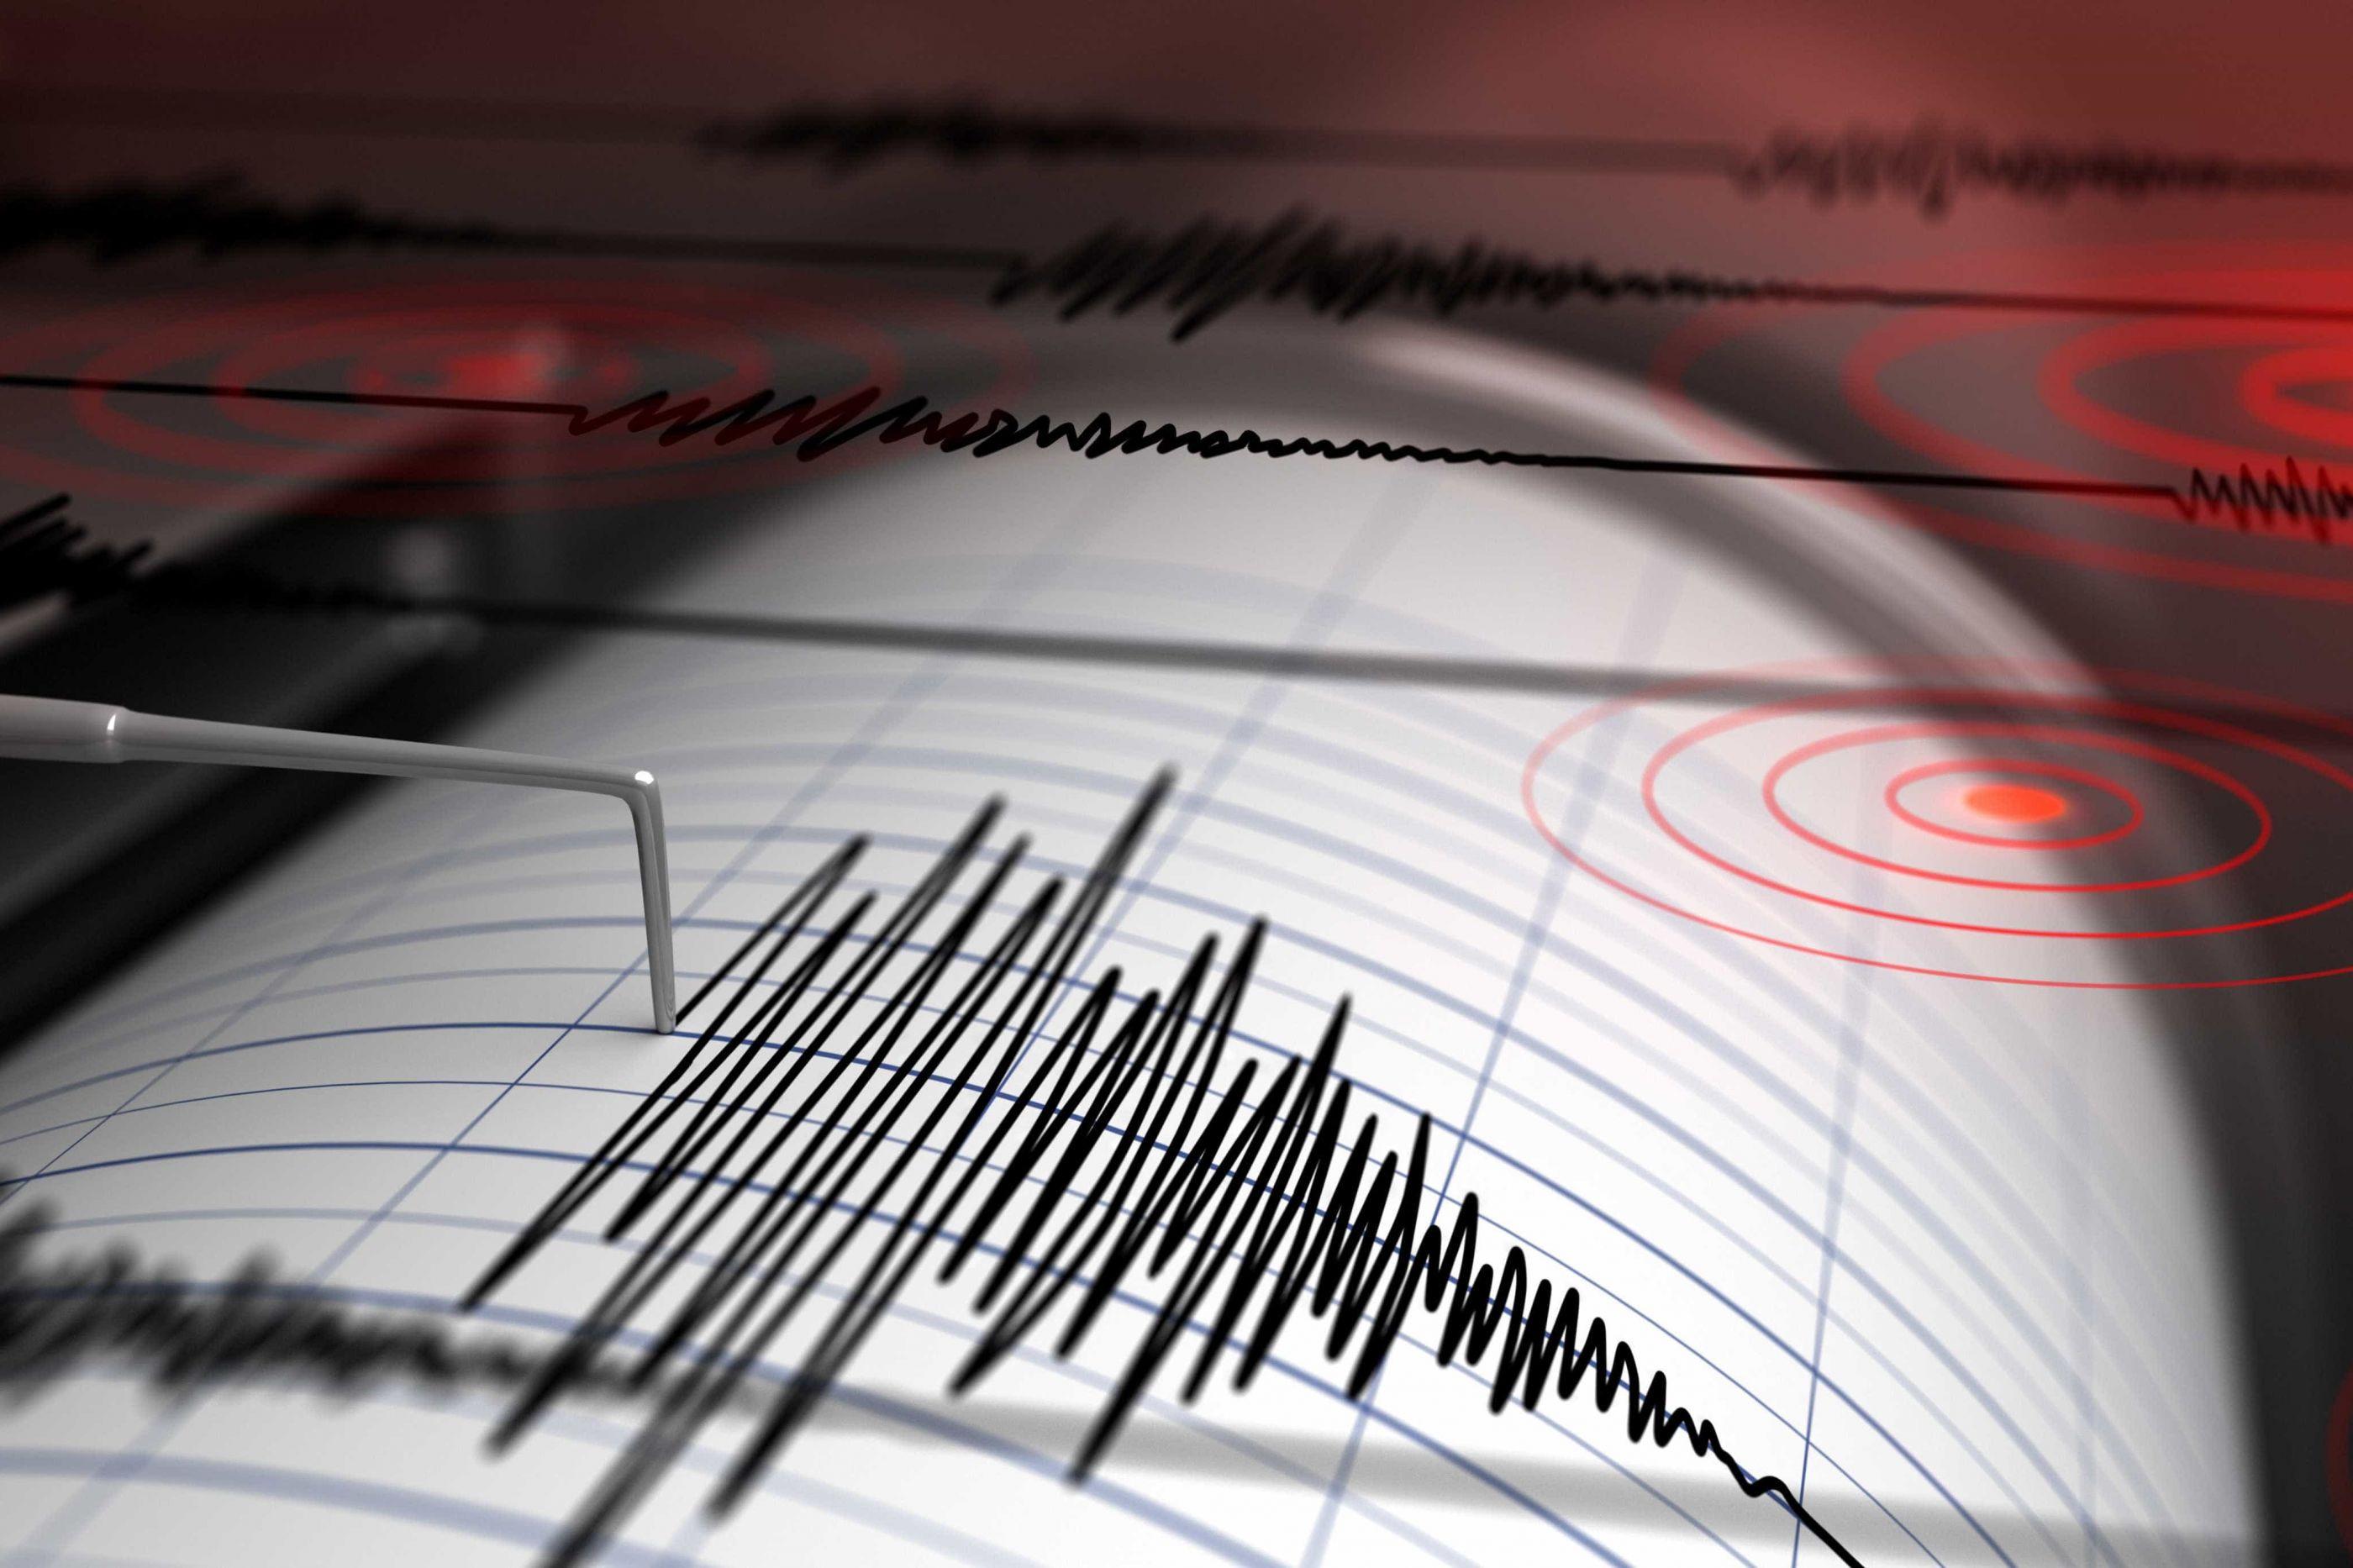 Terremoto de magnitude 6,4 atinge a Indonésia